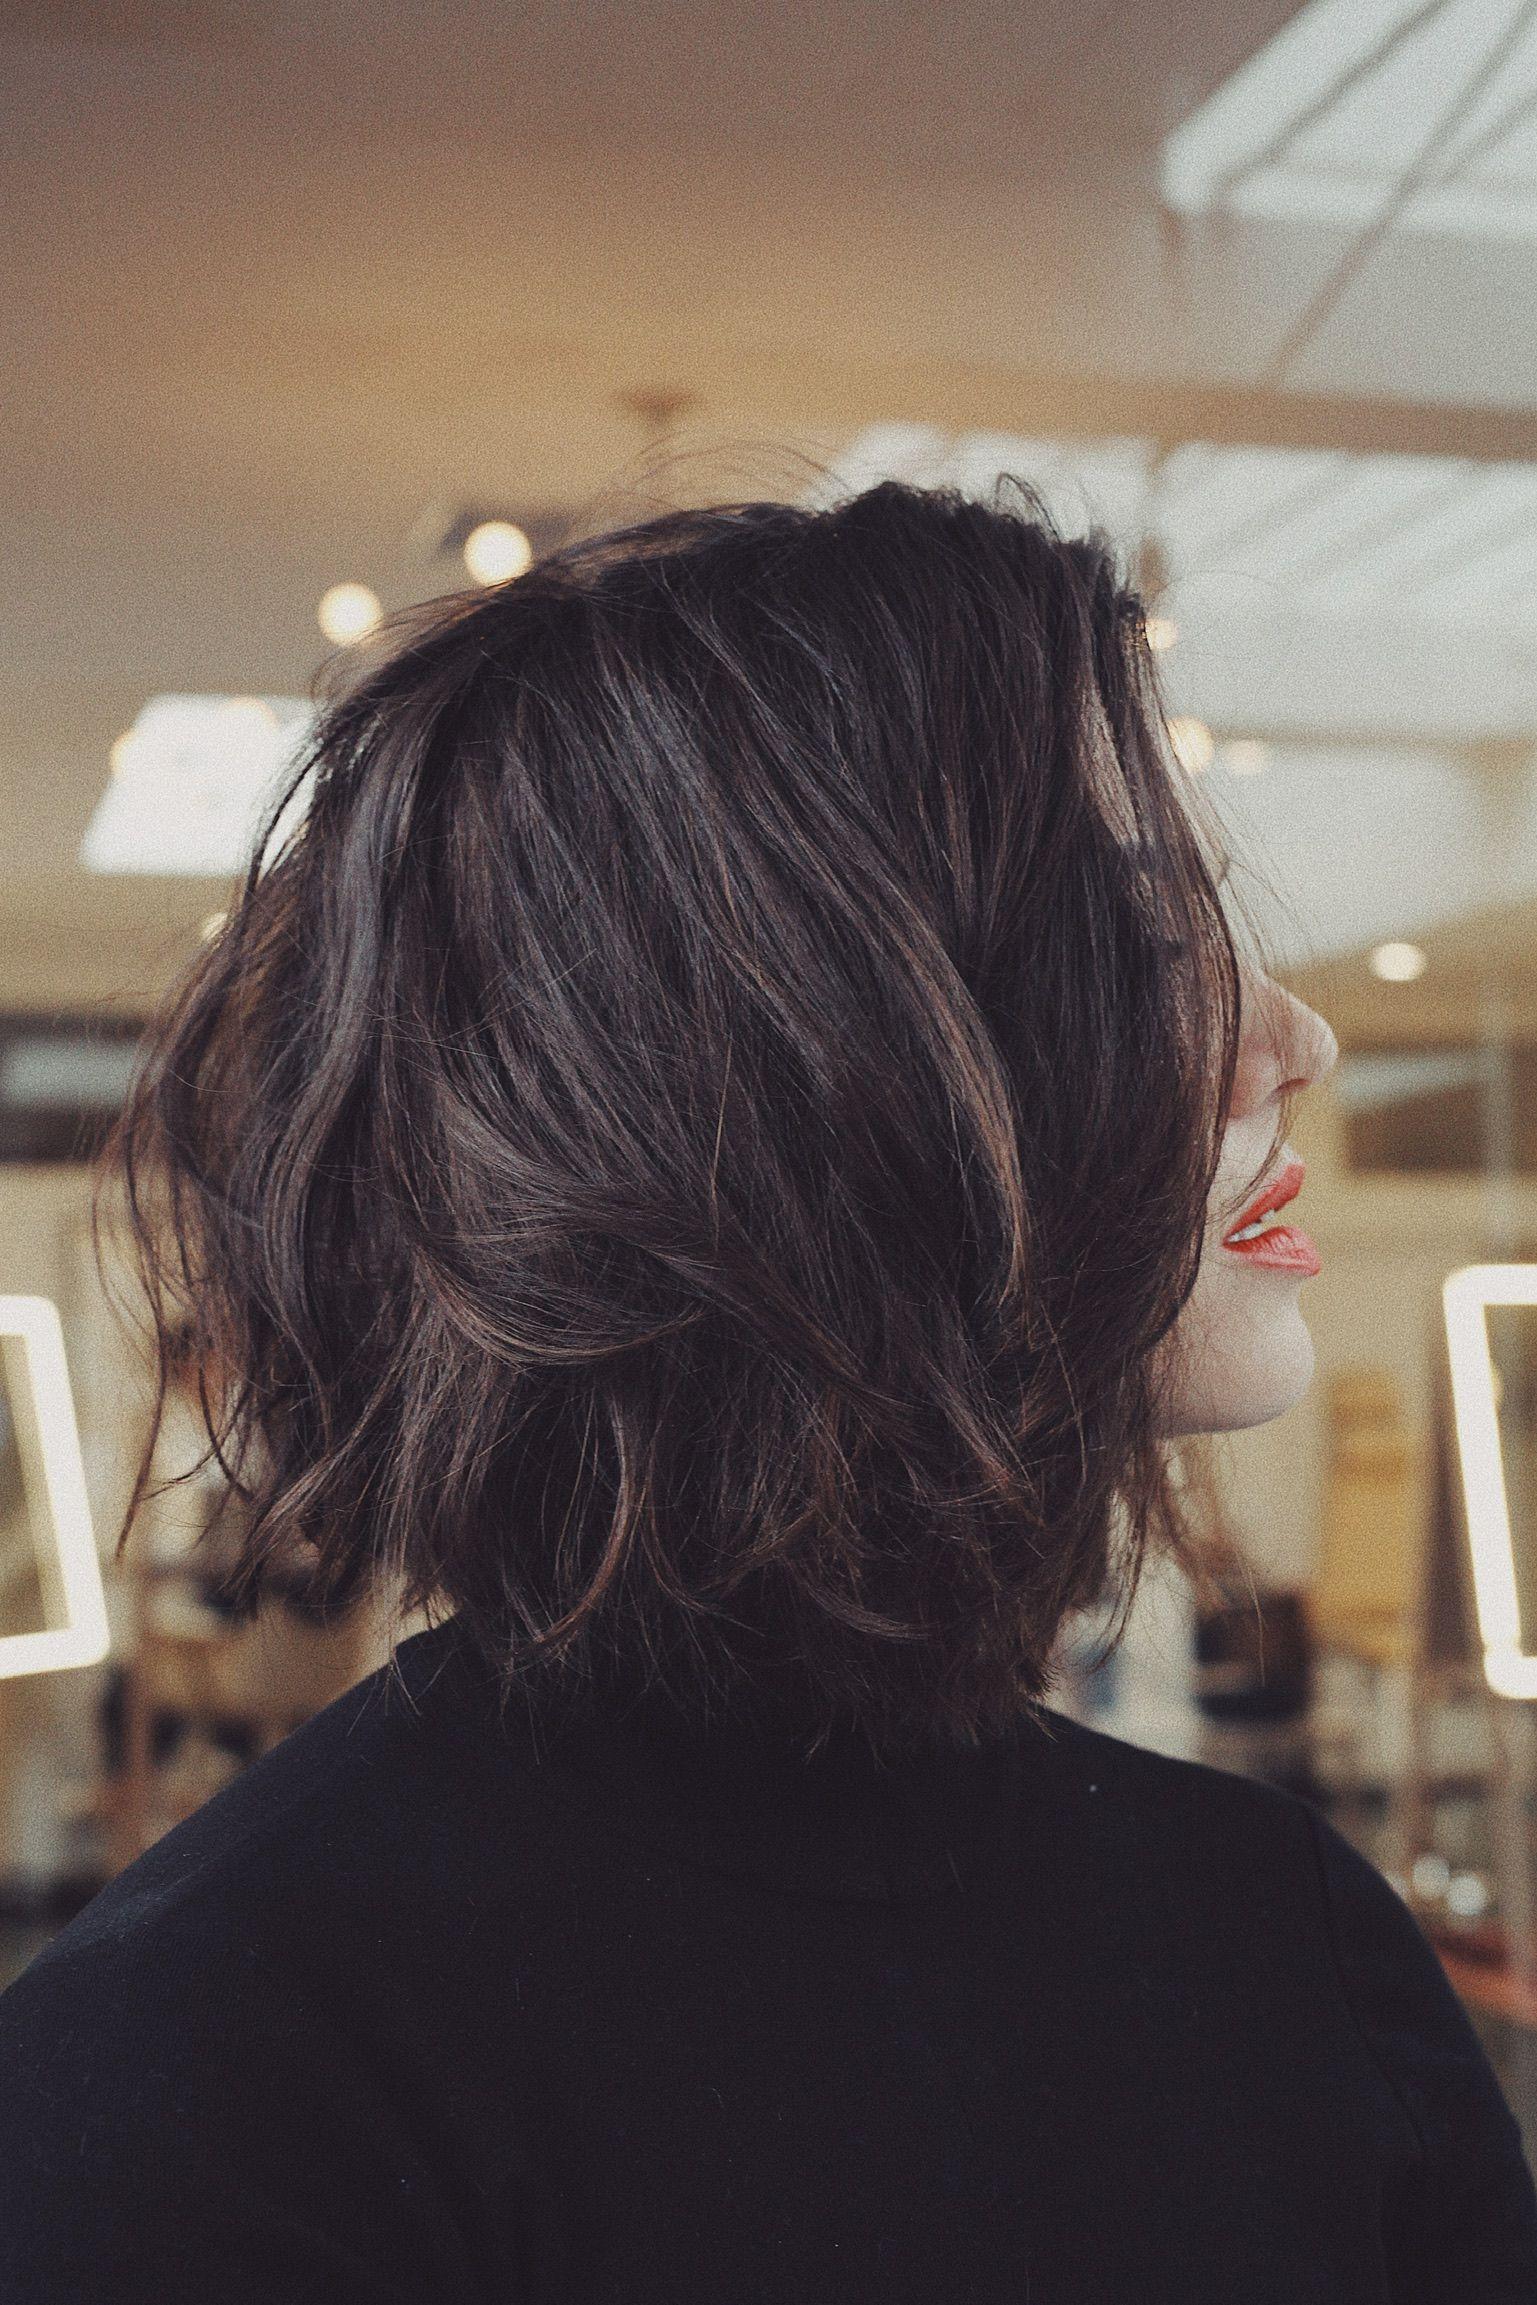 Mandy Moores New Bob Haircut  Mandy Moores Short Hair Looks Amazing